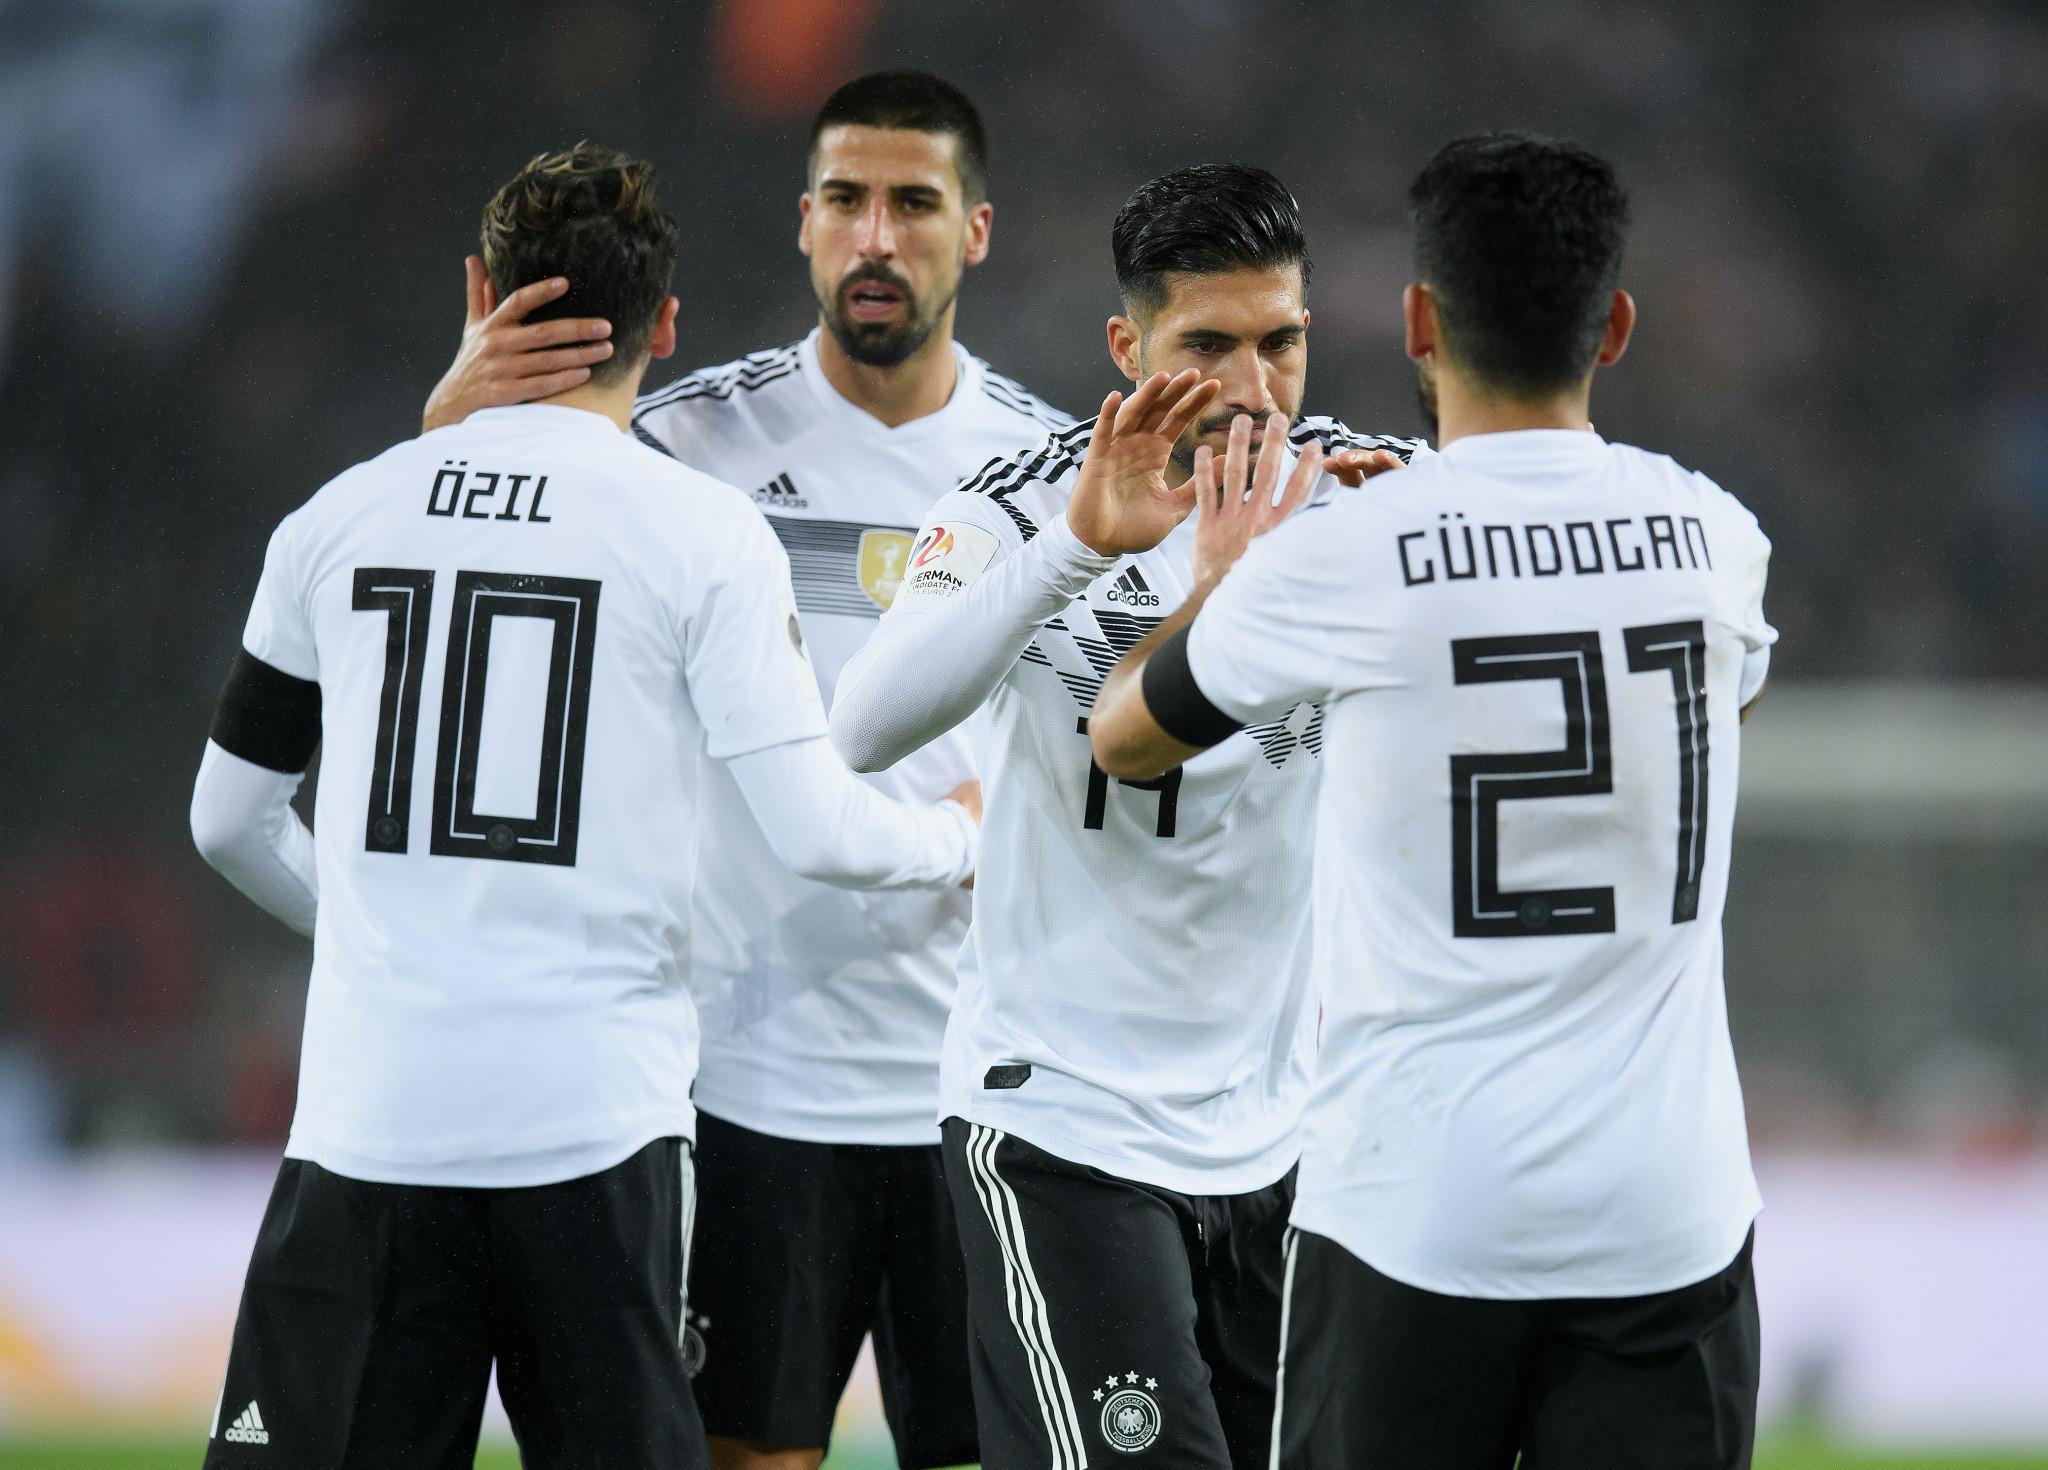 German internationals Özil and Gündogan criticised for meeting Turkish President Erdogan